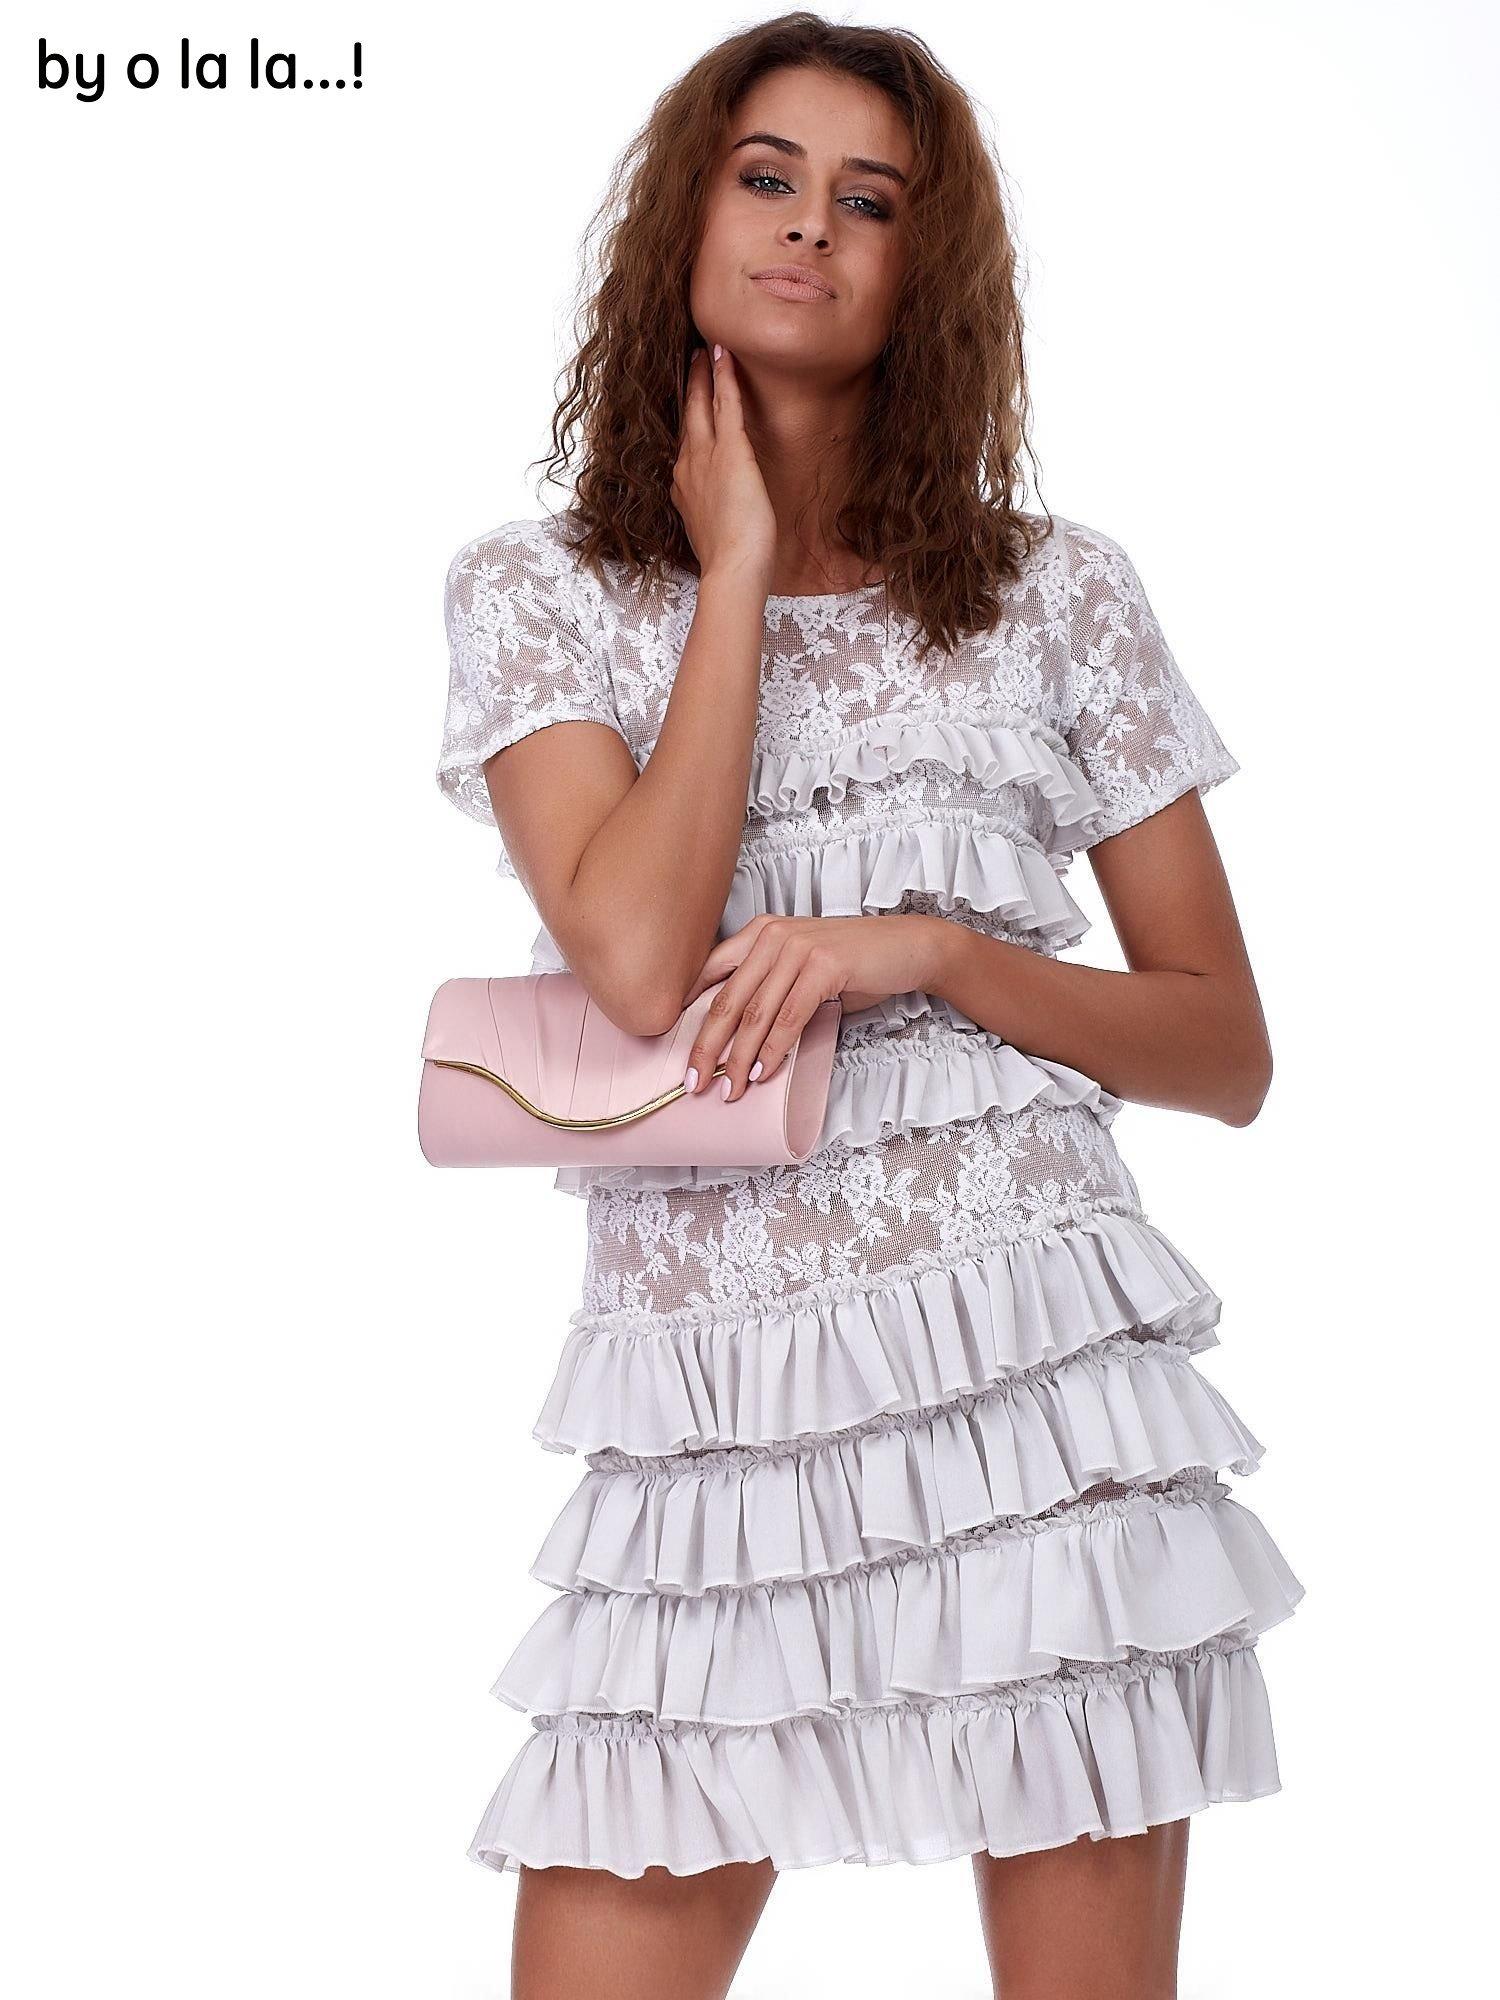 afc12a10d5 Sukienka szara koronkowa z falbanami BY O LA LA - Sukienka ...